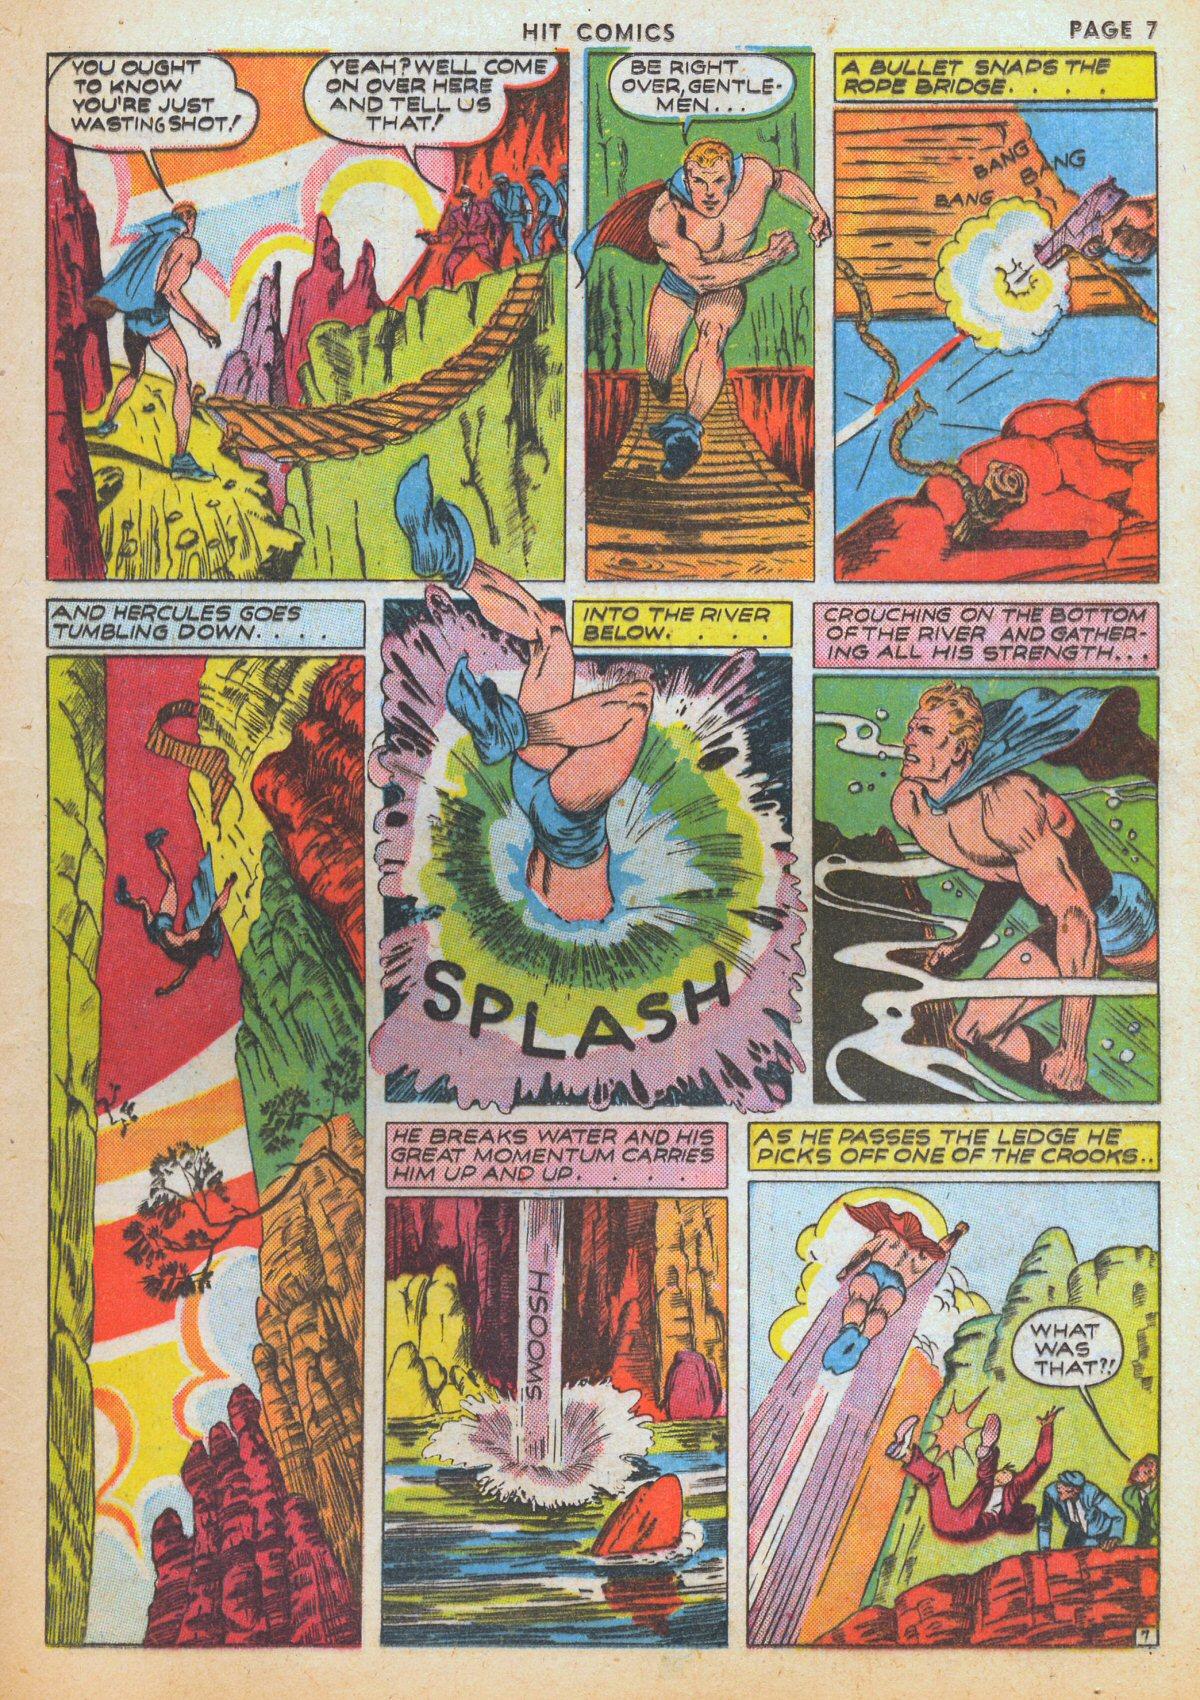 Read online Hit Comics comic -  Issue #12 - 9